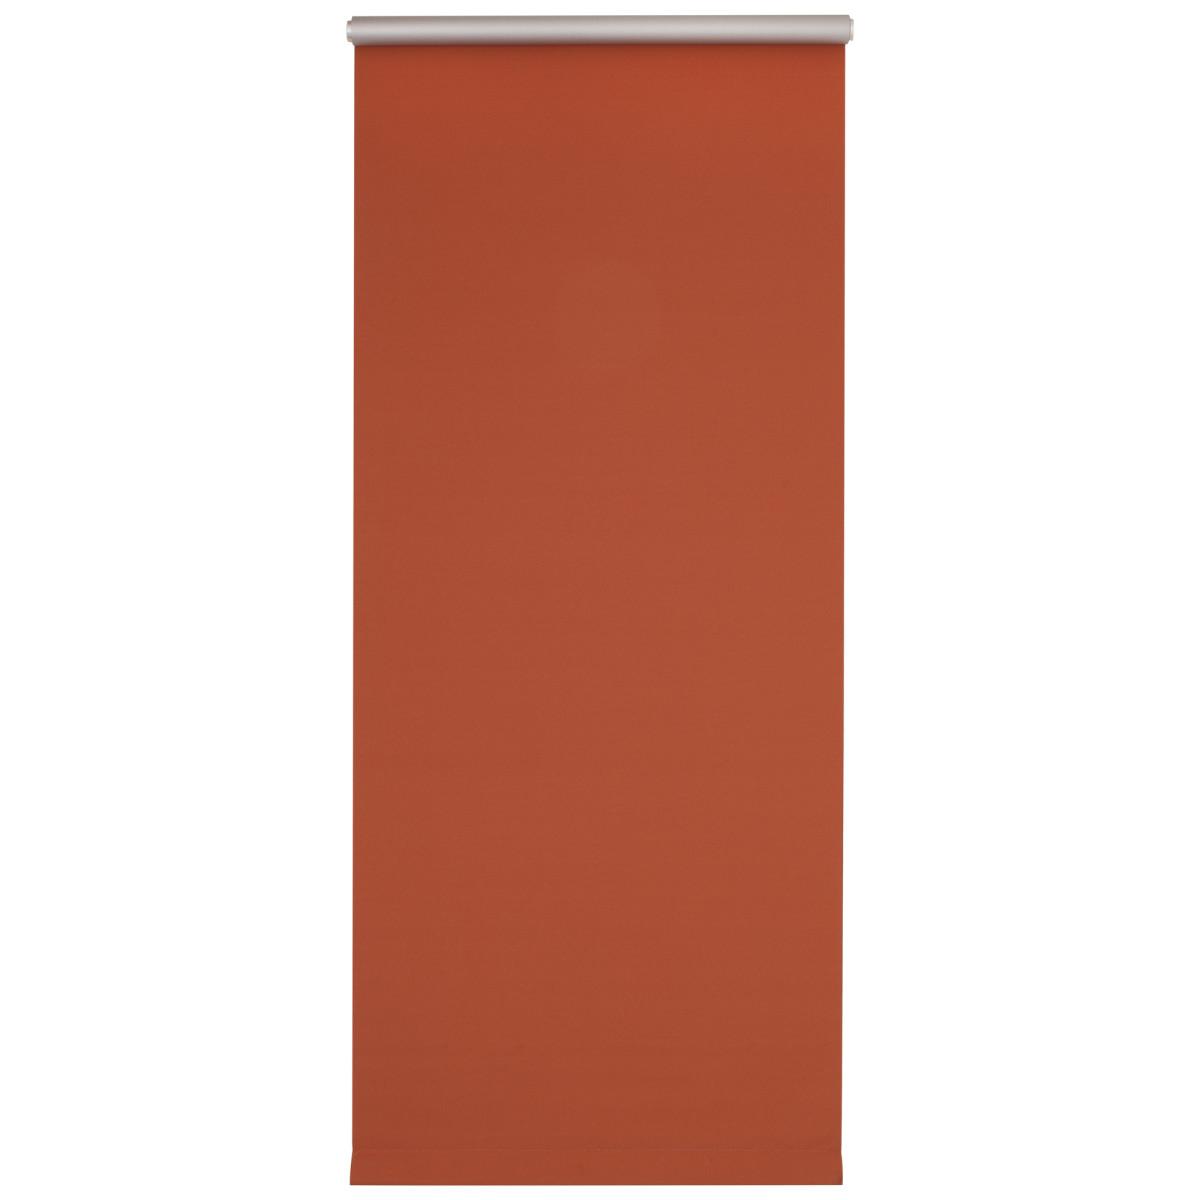 Мини-Штора рулонная Blackout 40х150 см цвет оранжевый